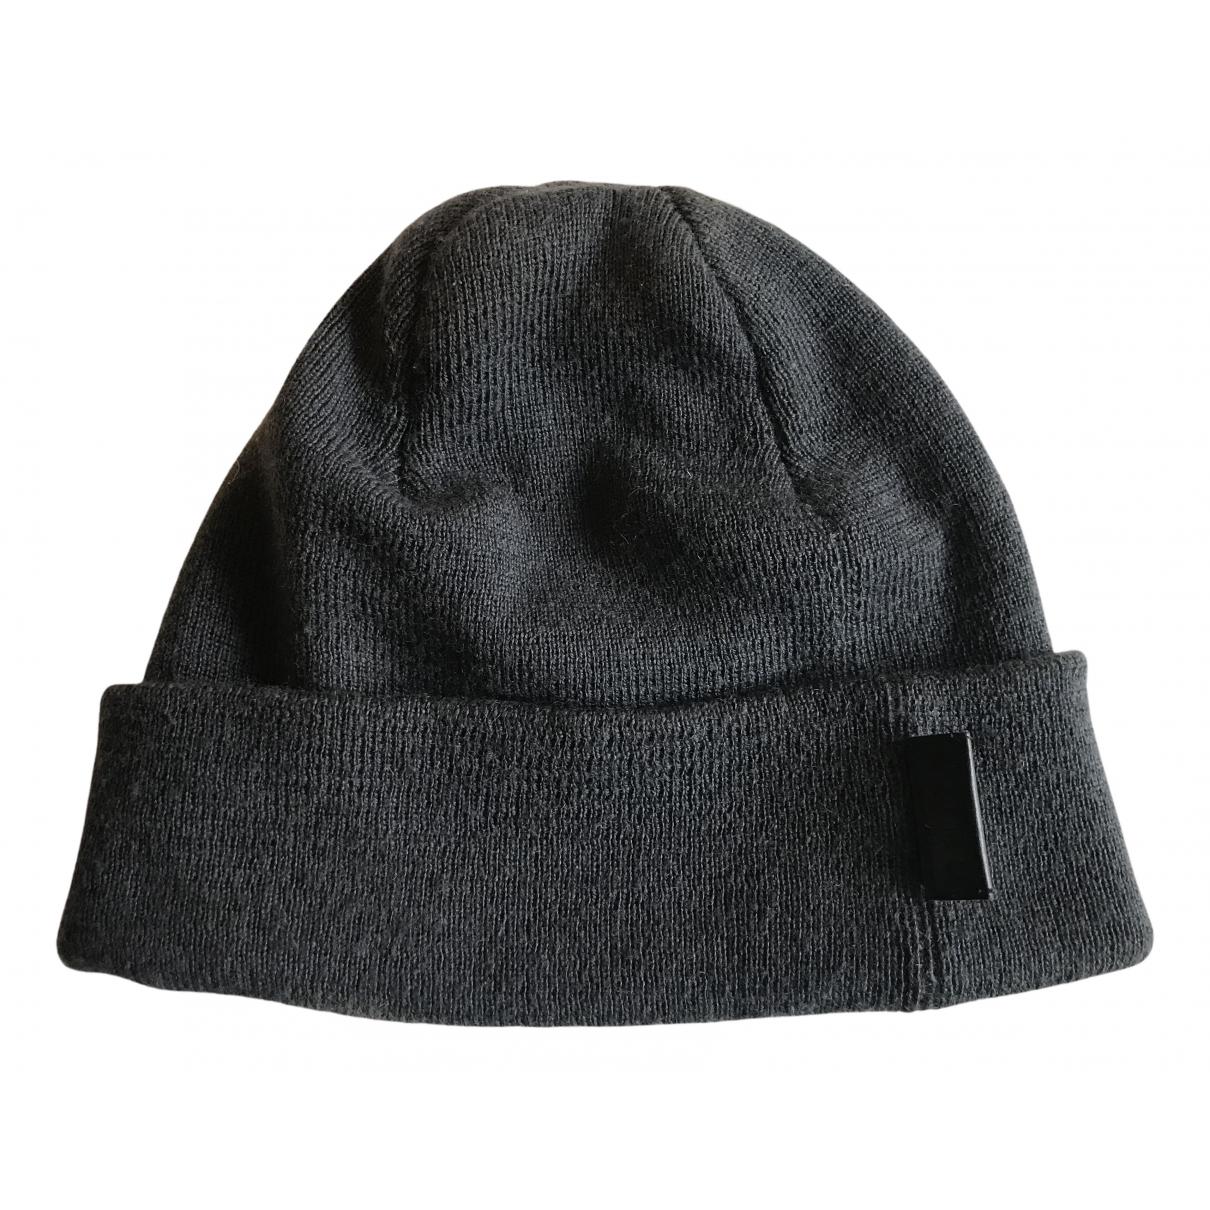 Gucci N Grey Wool hat & pull on hat for Men L International